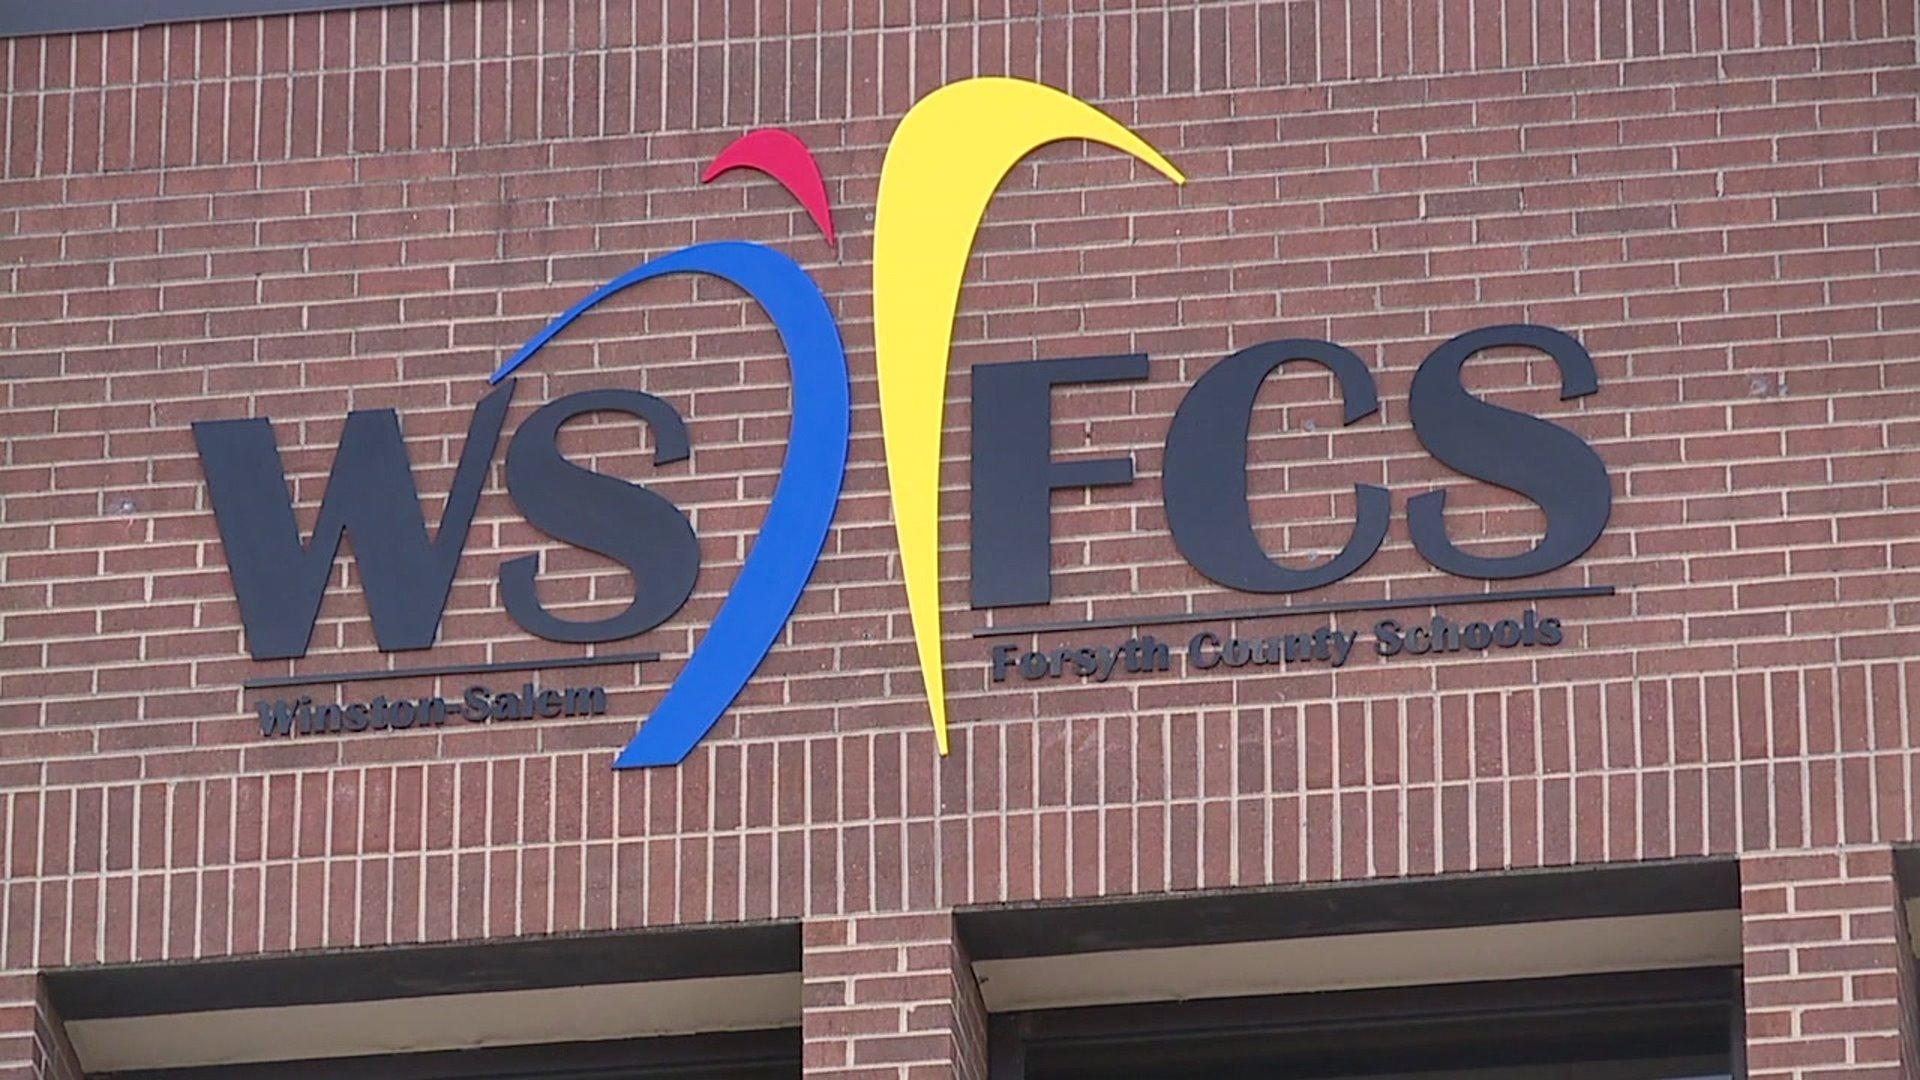 Winston Salem/forsyth County Schools Holds Meeting To Intended For Winston Salem Salem Forsyth County School Calendar